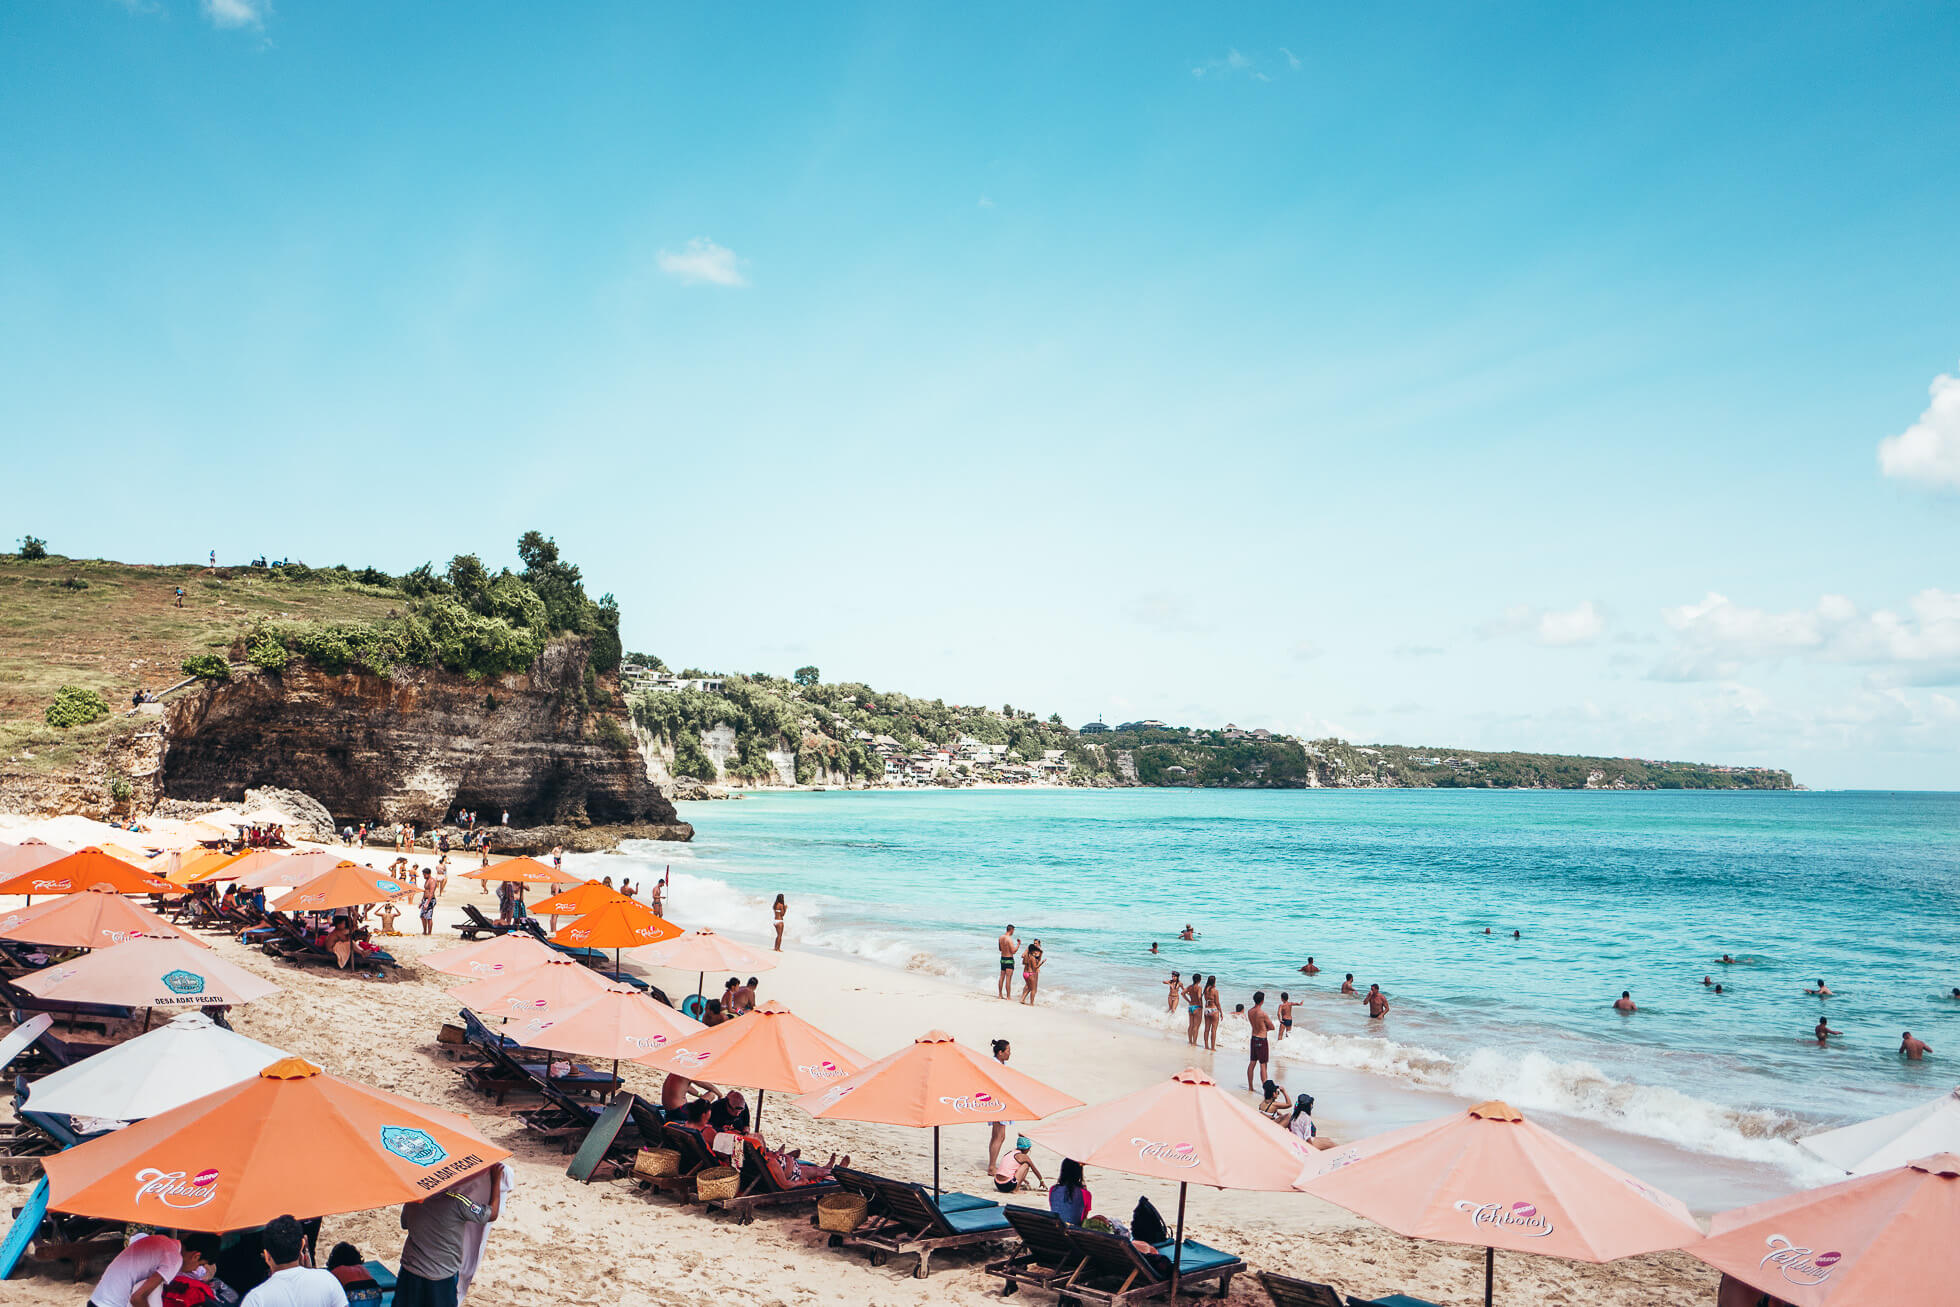 janni-deler-dreamland-beach-baliL1010608